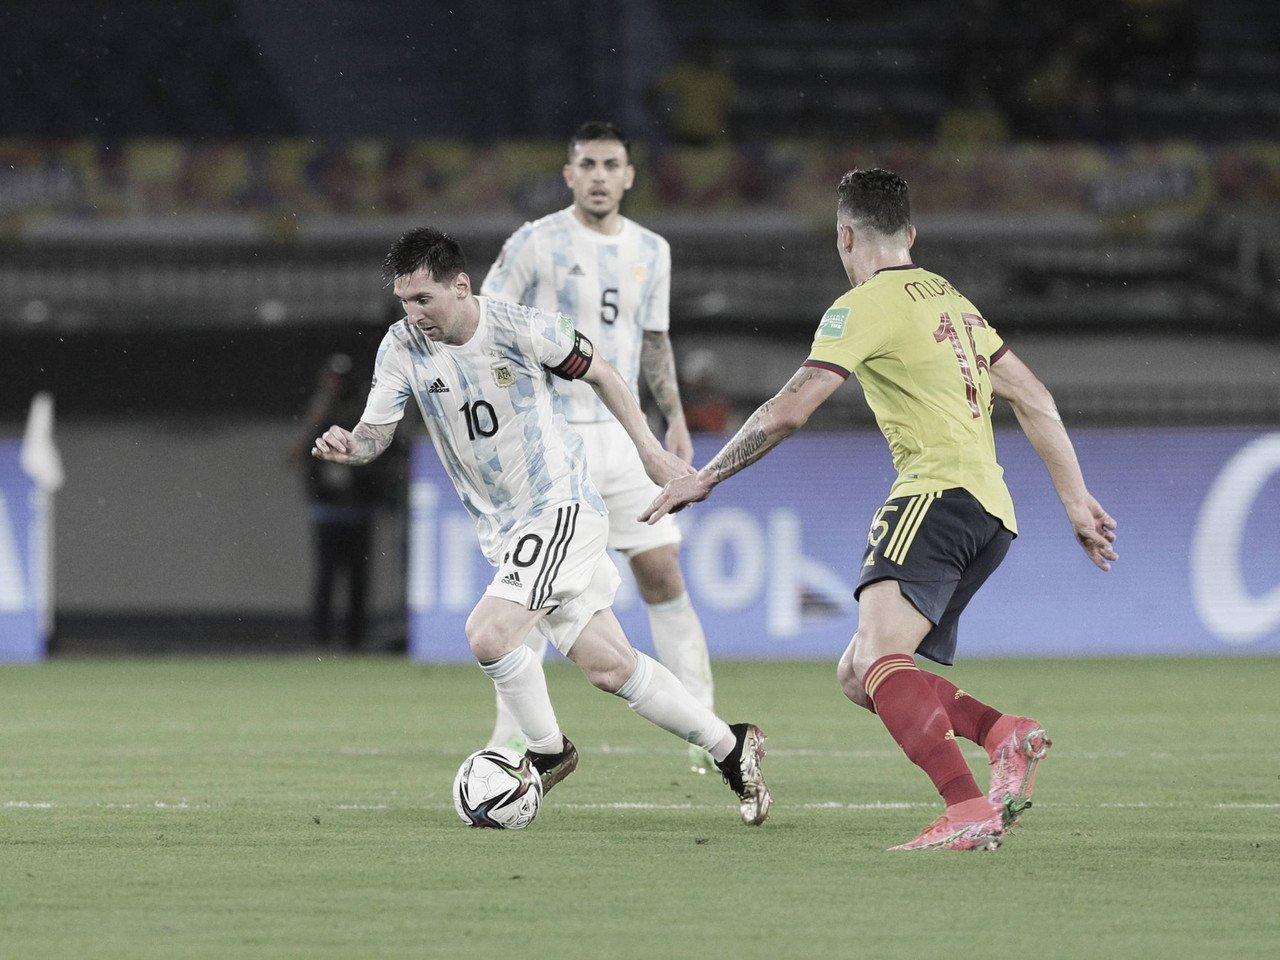 En el final, Colombia amargó a la Argentina